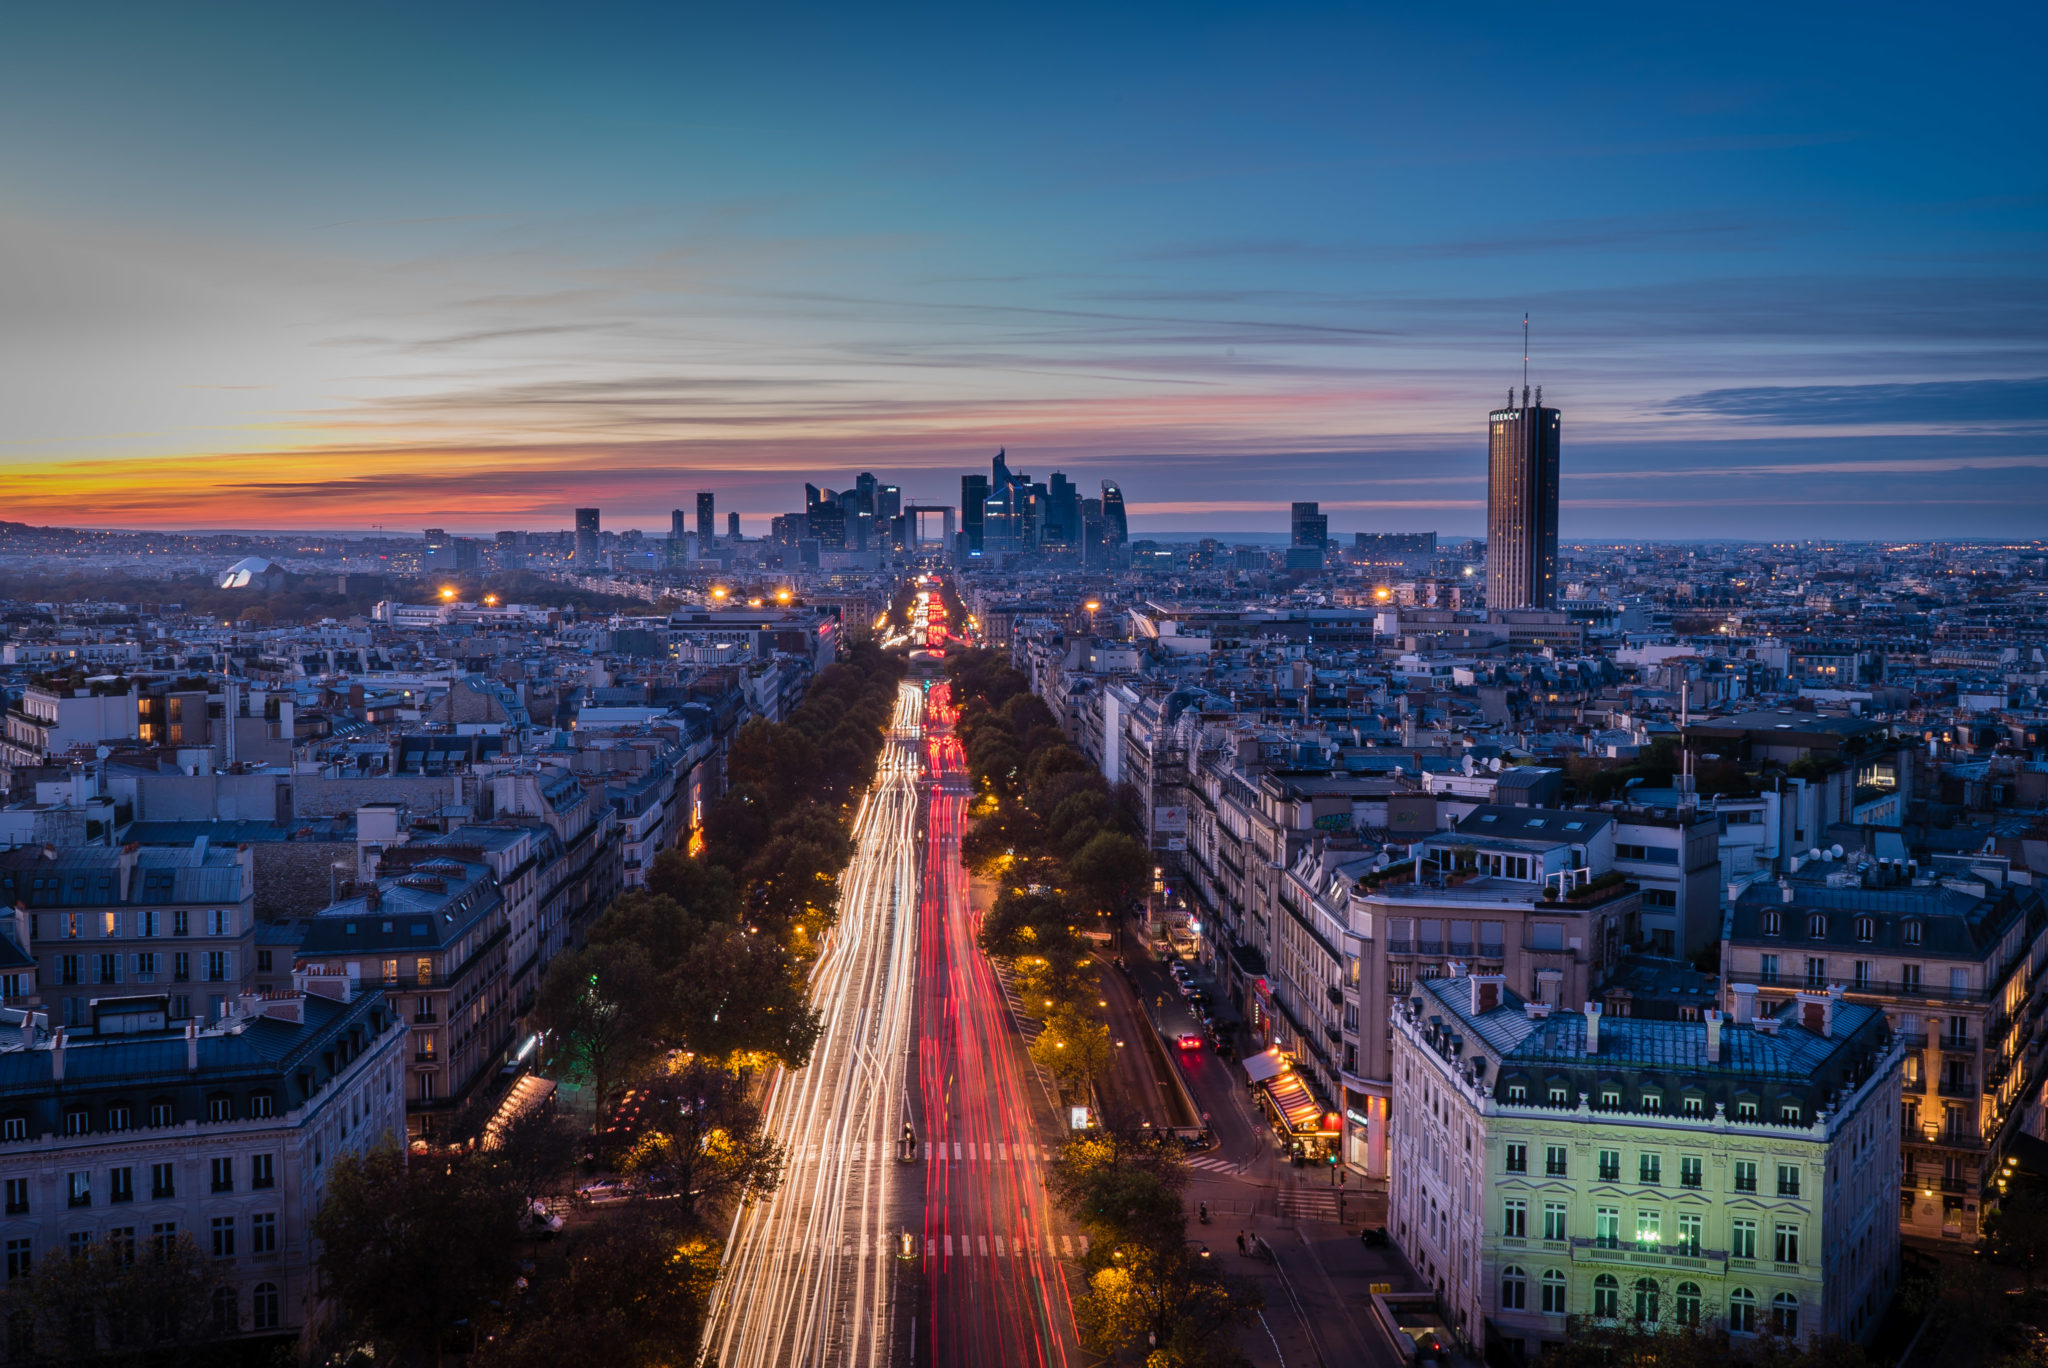 investir-a-nanterre-grand-paris-bertrand-demanes